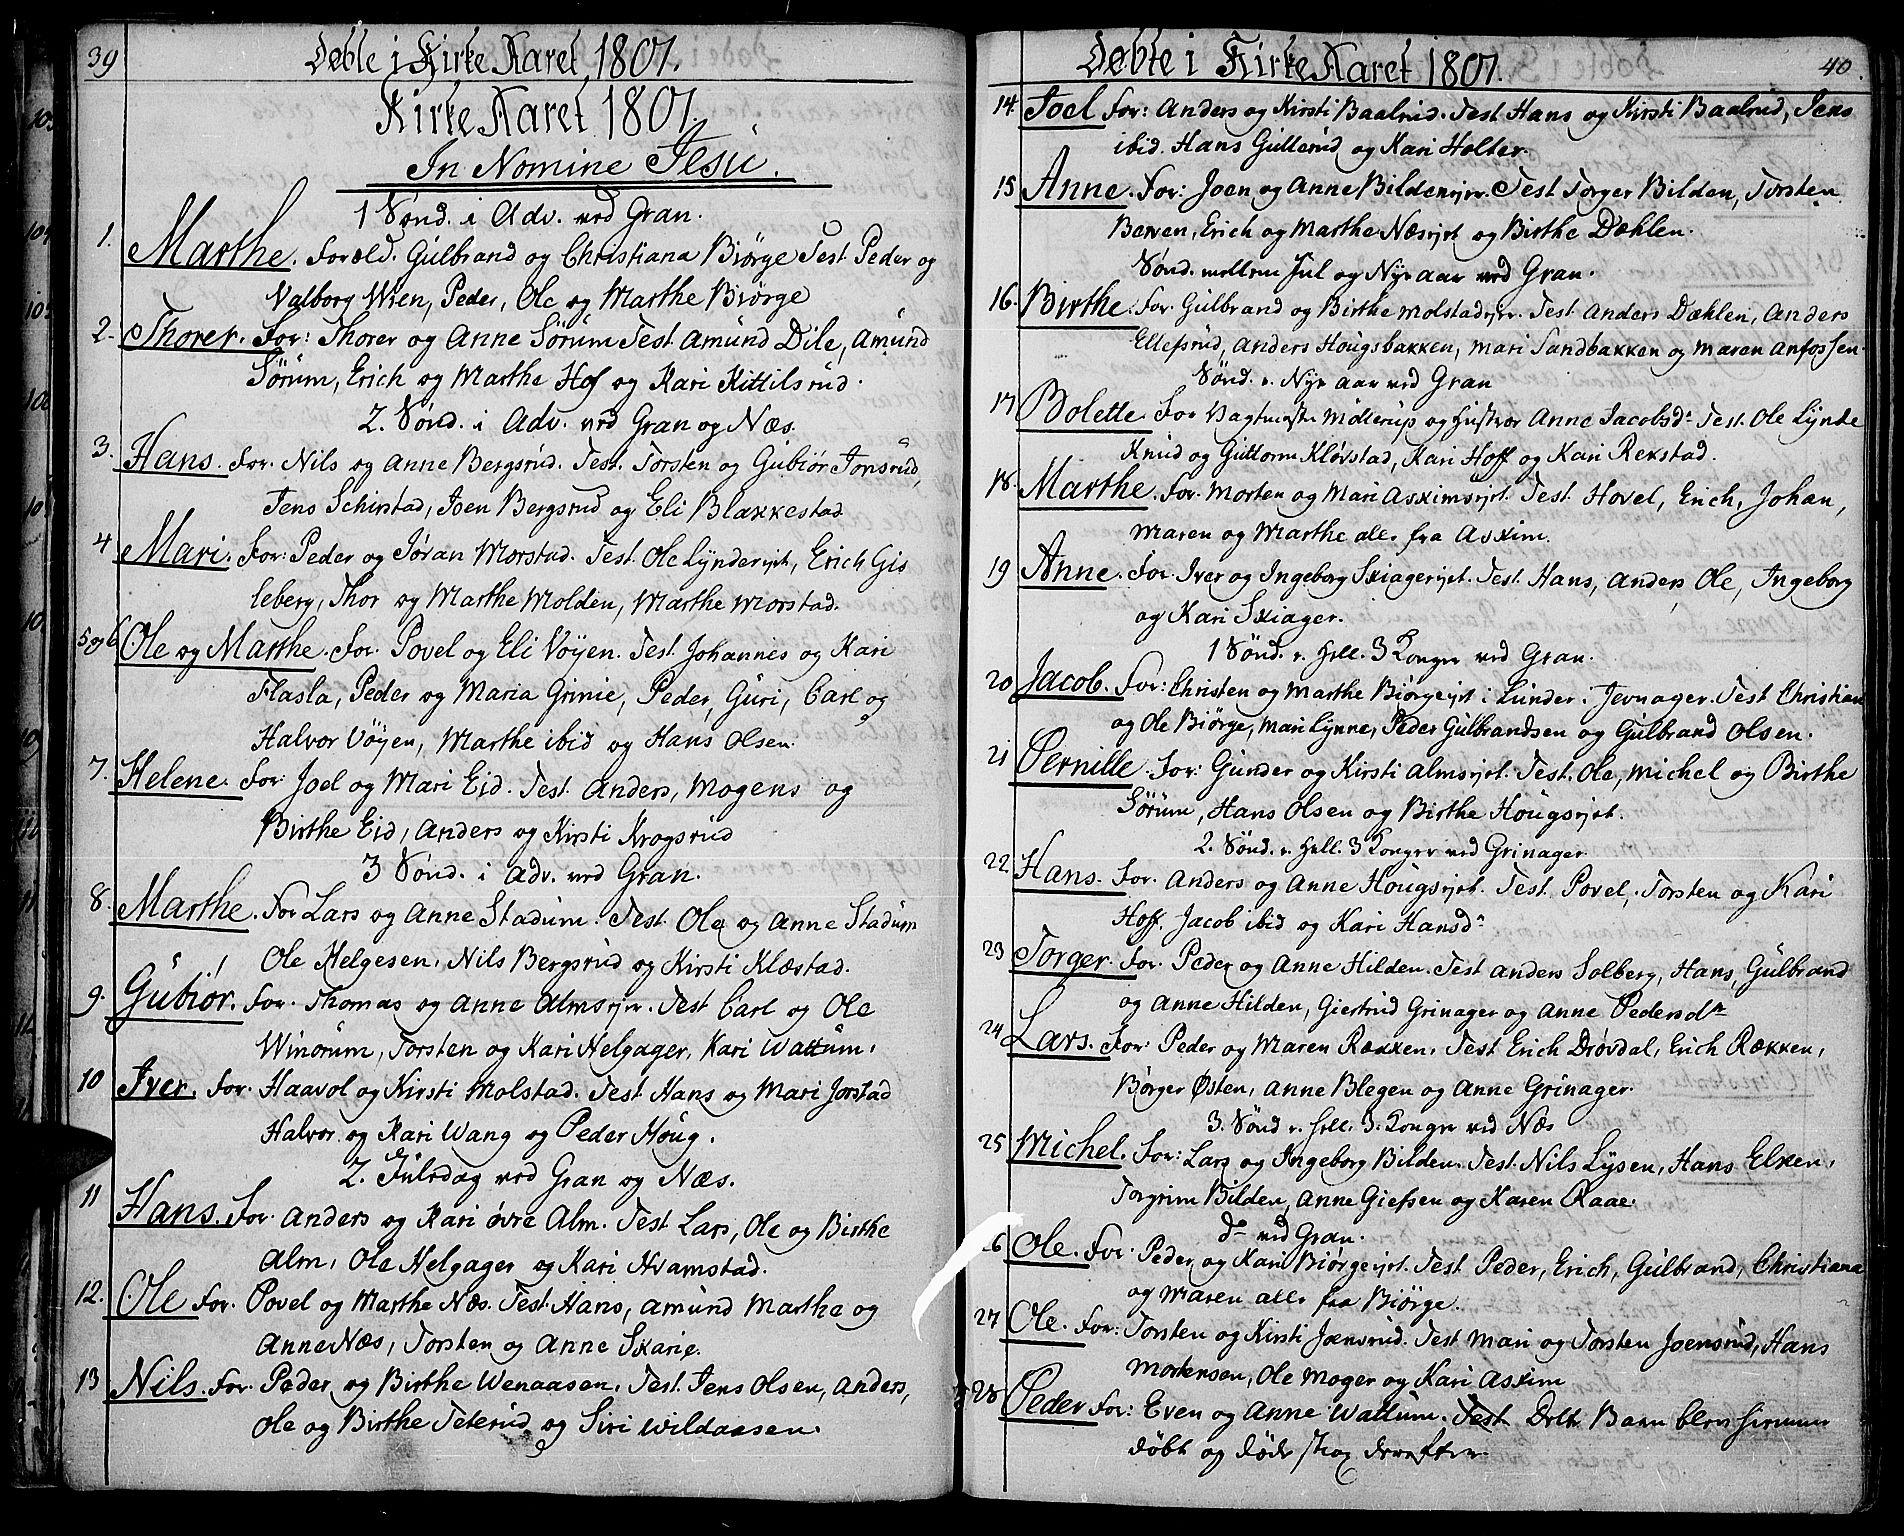 SAH, Gran prestekontor, Ministerialbok nr. 8, 1798-1811, s. 39-40